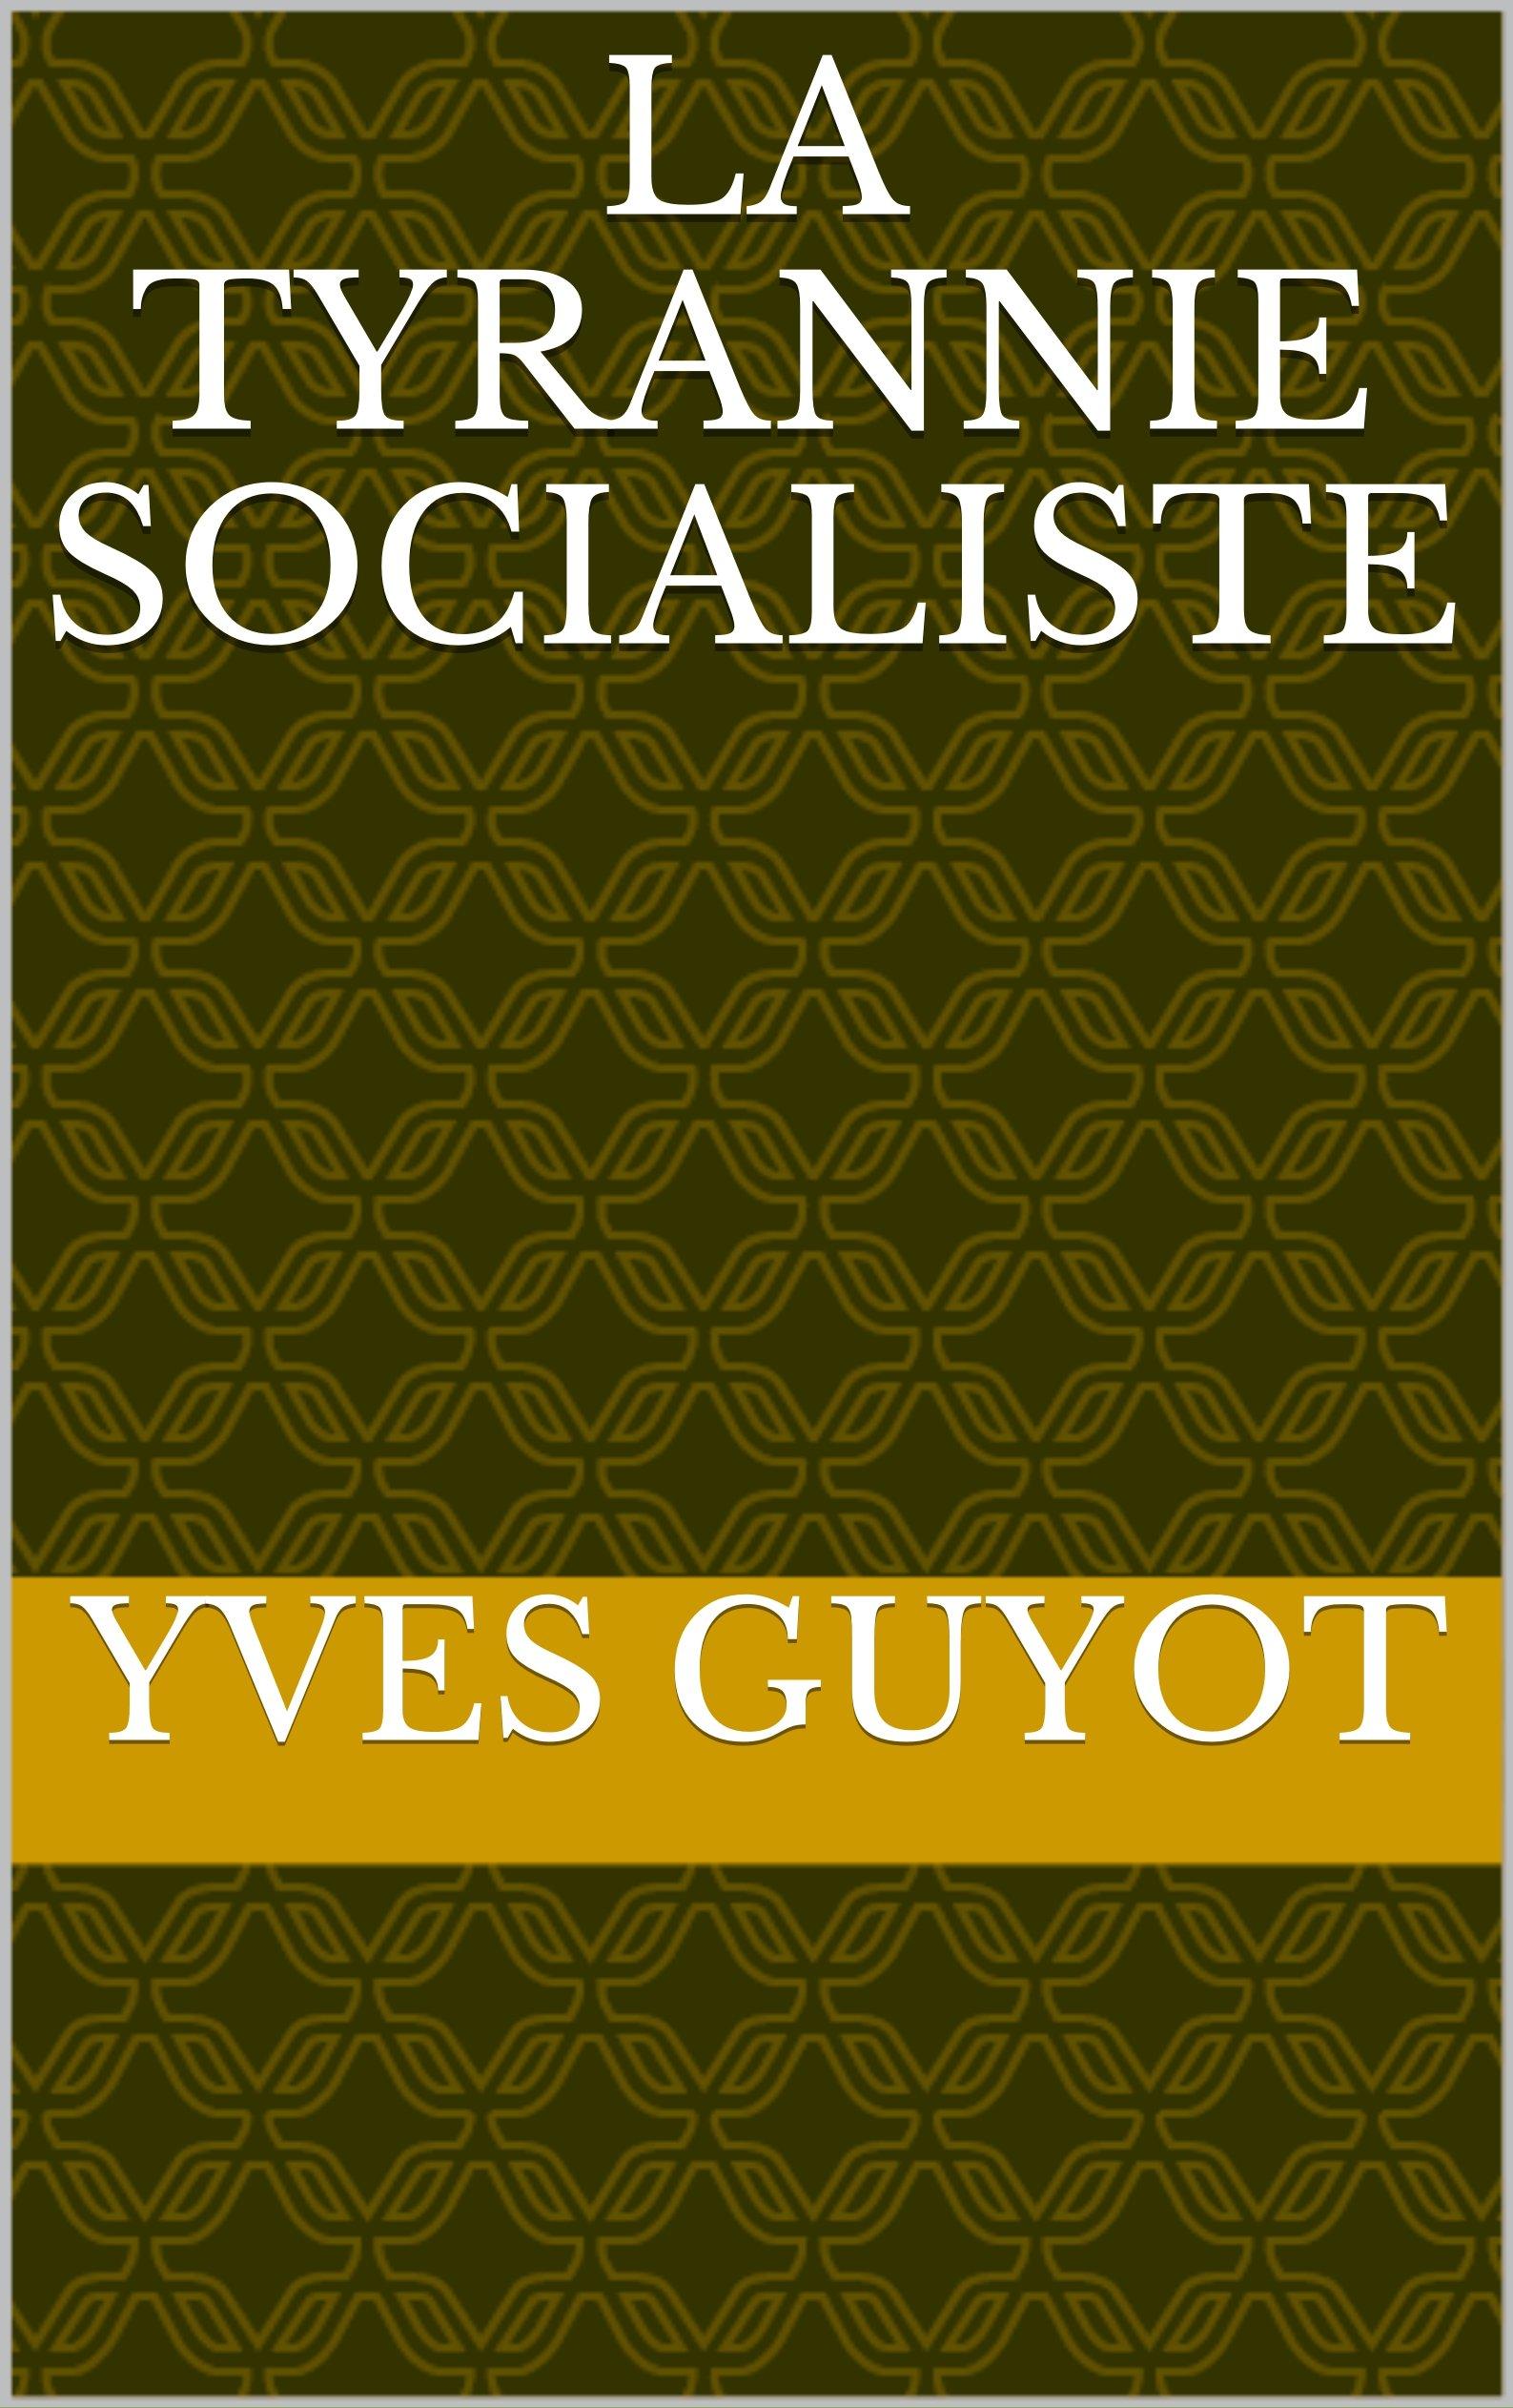 La Tyrannie Socialiste (French Edition)